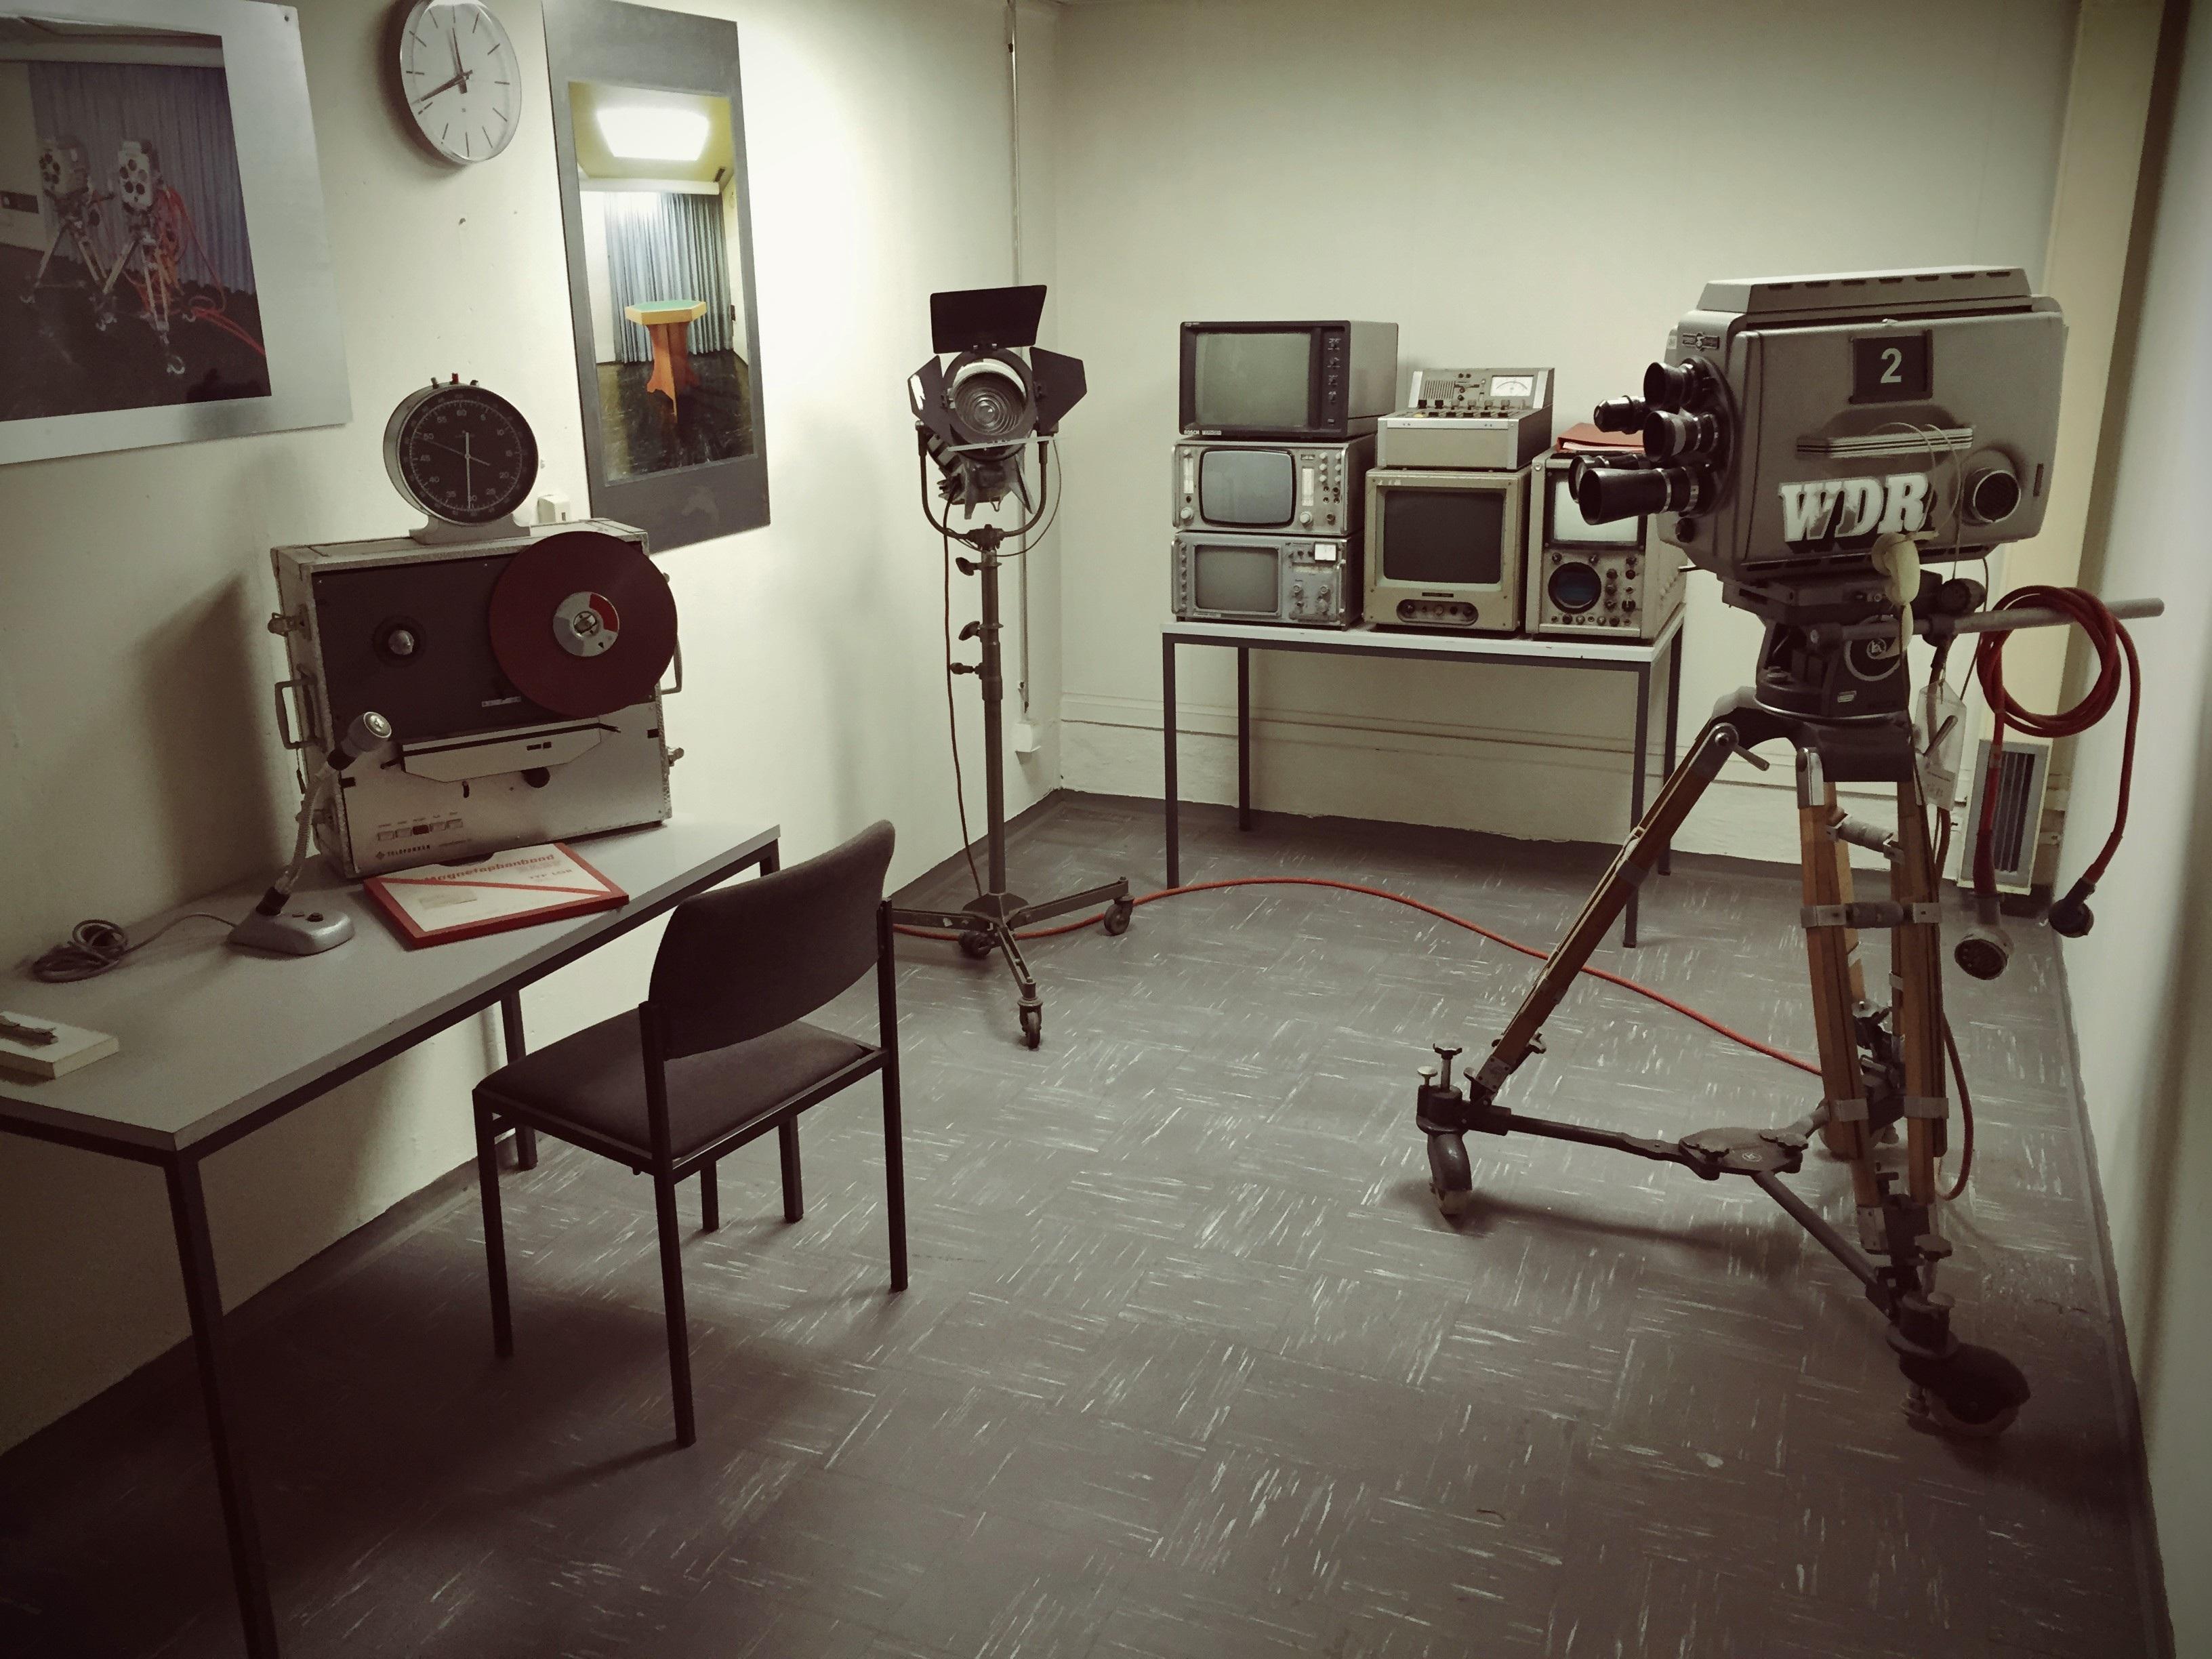 images gratuites cam ra r tro maison sol b timent film studio propri t chambre. Black Bedroom Furniture Sets. Home Design Ideas